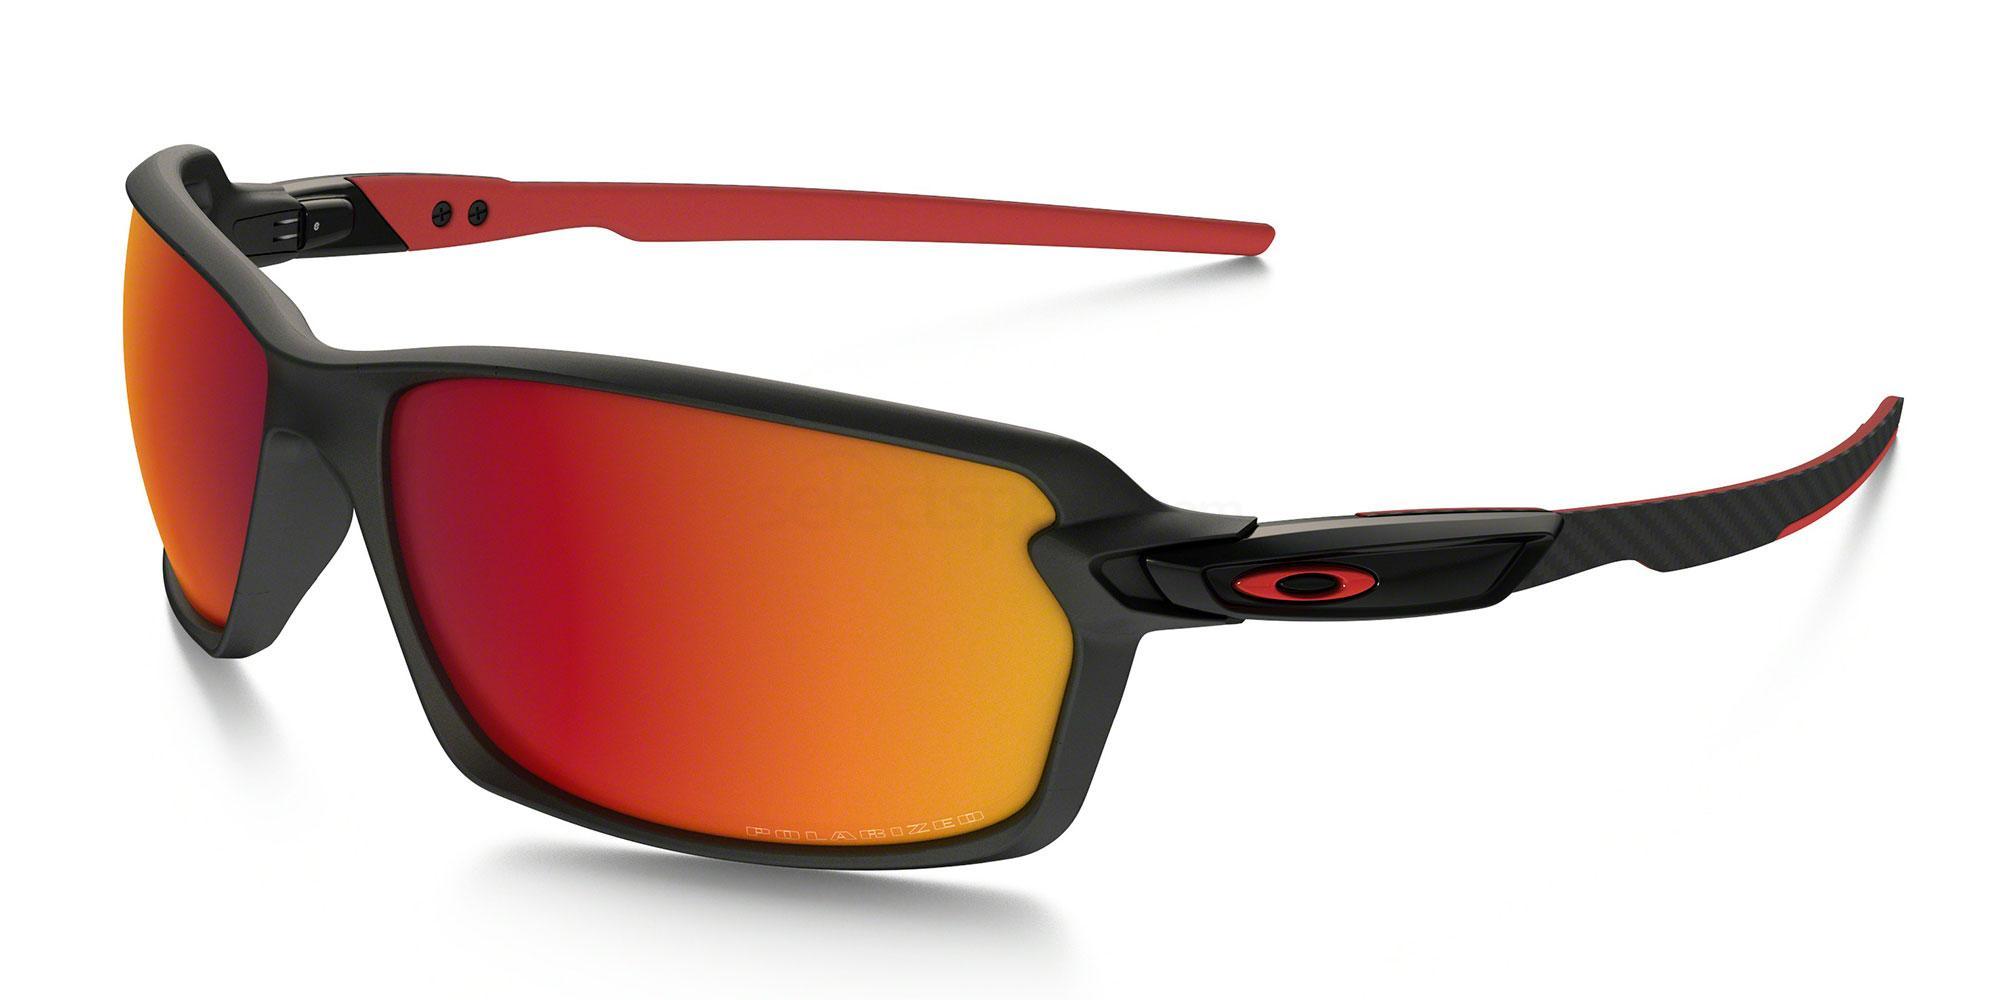 930204 OO9302 CARBON SHIFT POLARIZED Sunglasses, Oakley